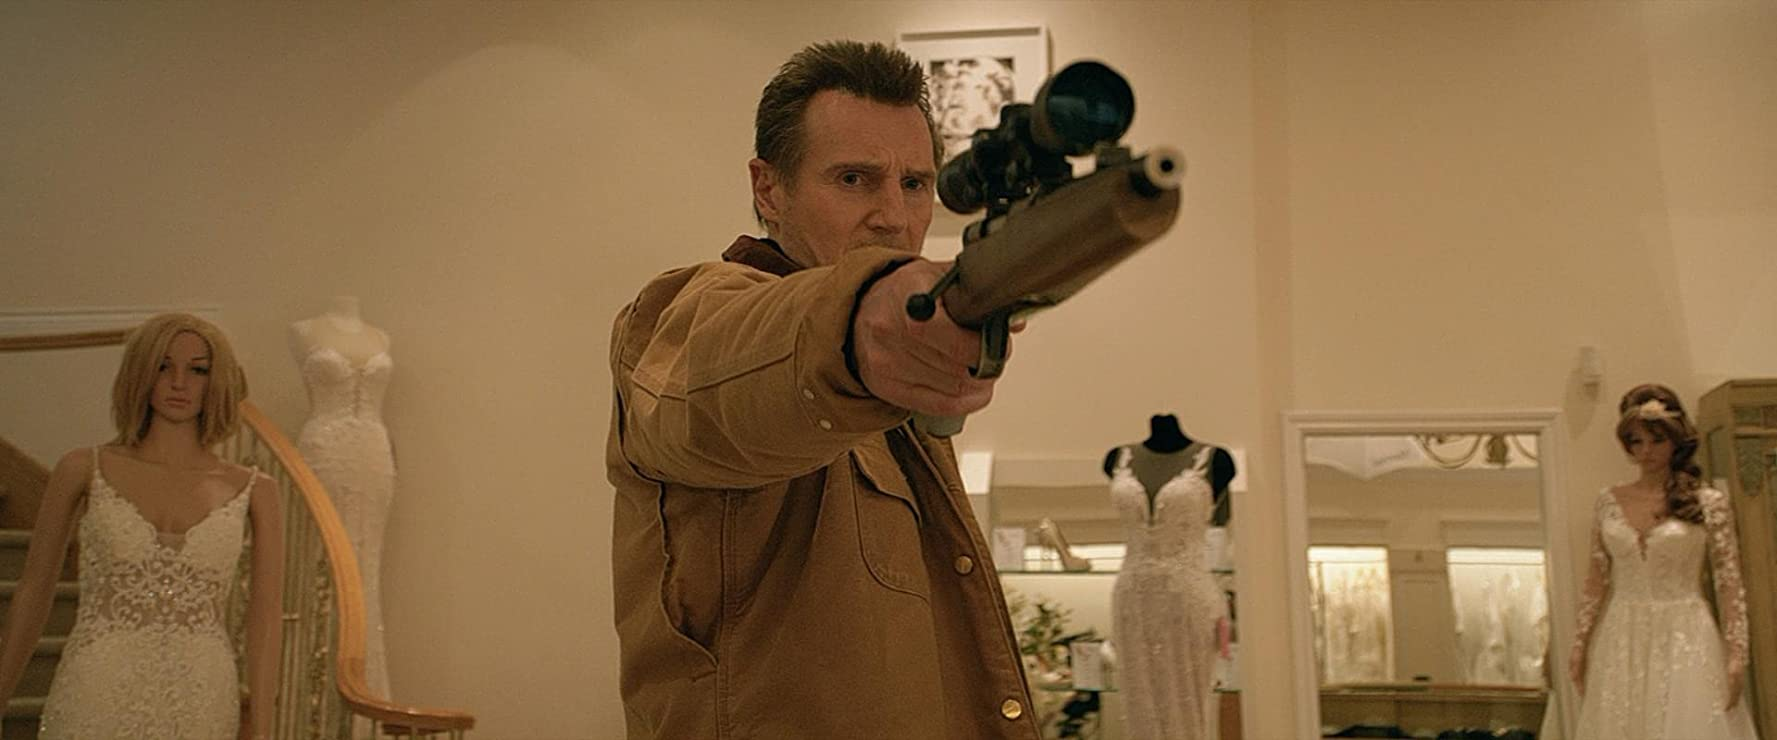 Liam Neeson in Cold Pursuit (2019)